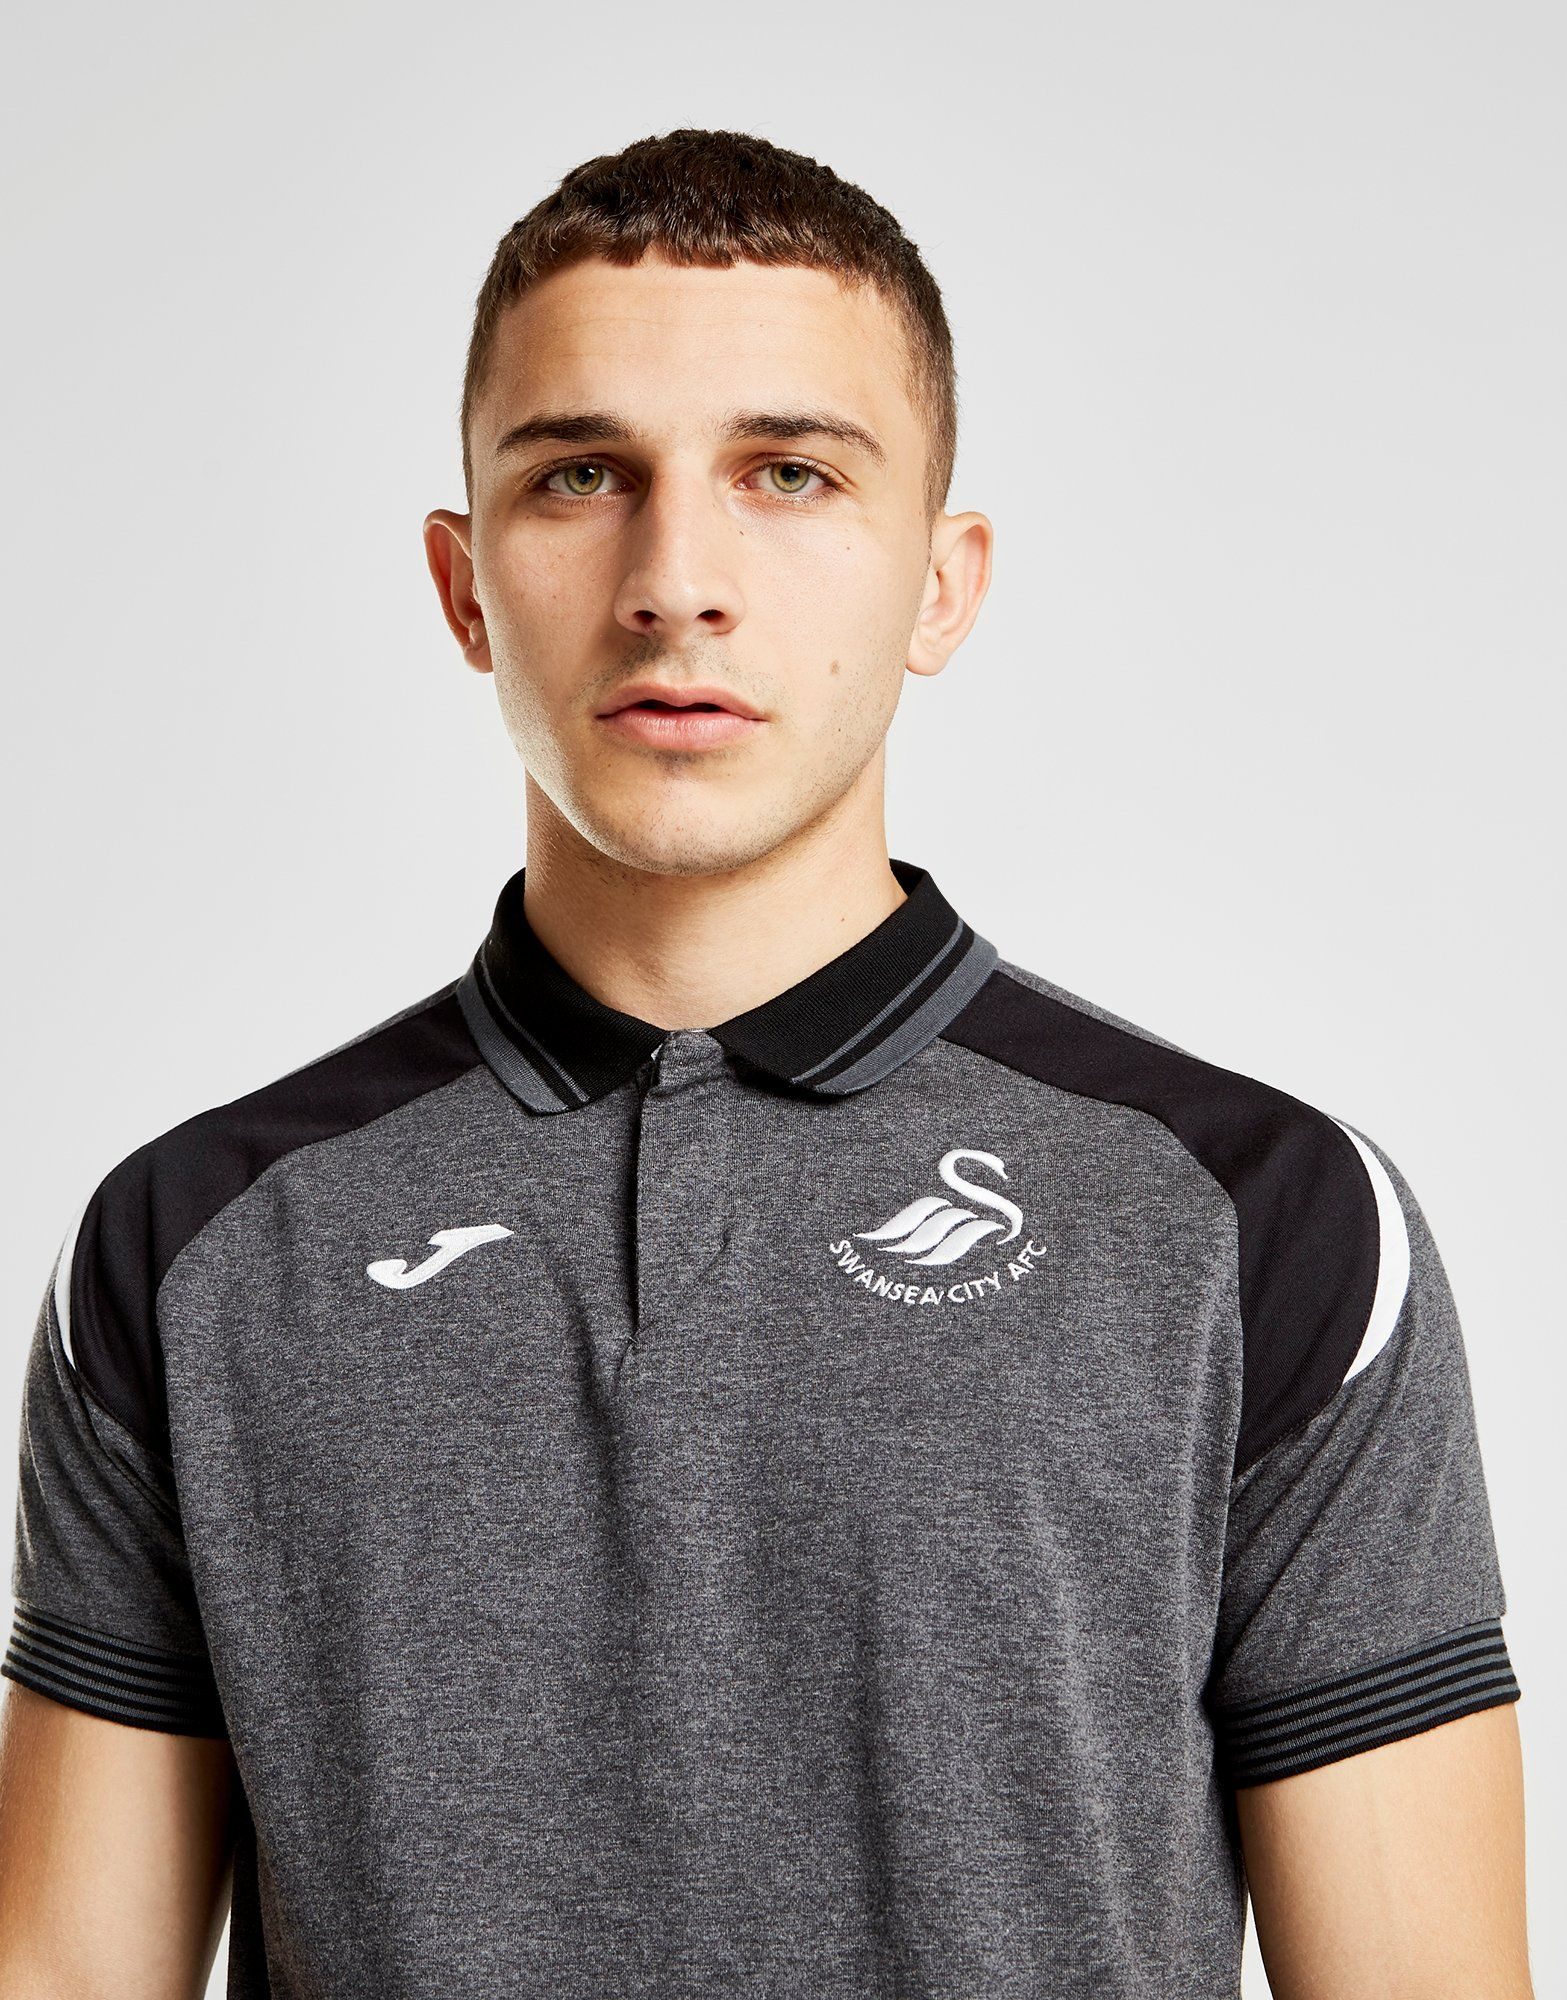 Joma Swansea City FC 2018/19 Training Polo Shirt